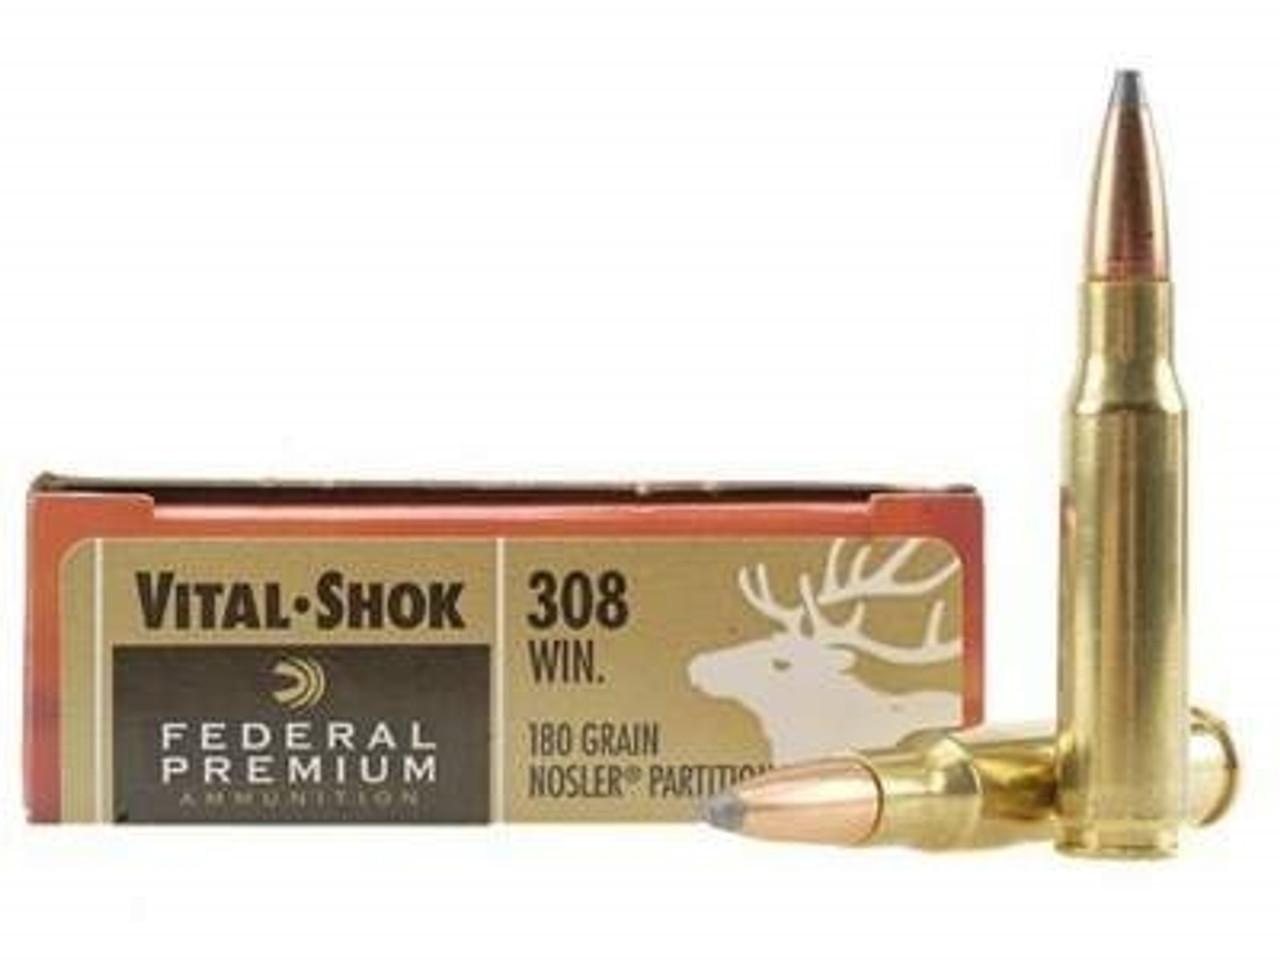 Federal 308 Win Ammunition Vital-Shok P308E 180 Grain Nosler Partition 20  rounds